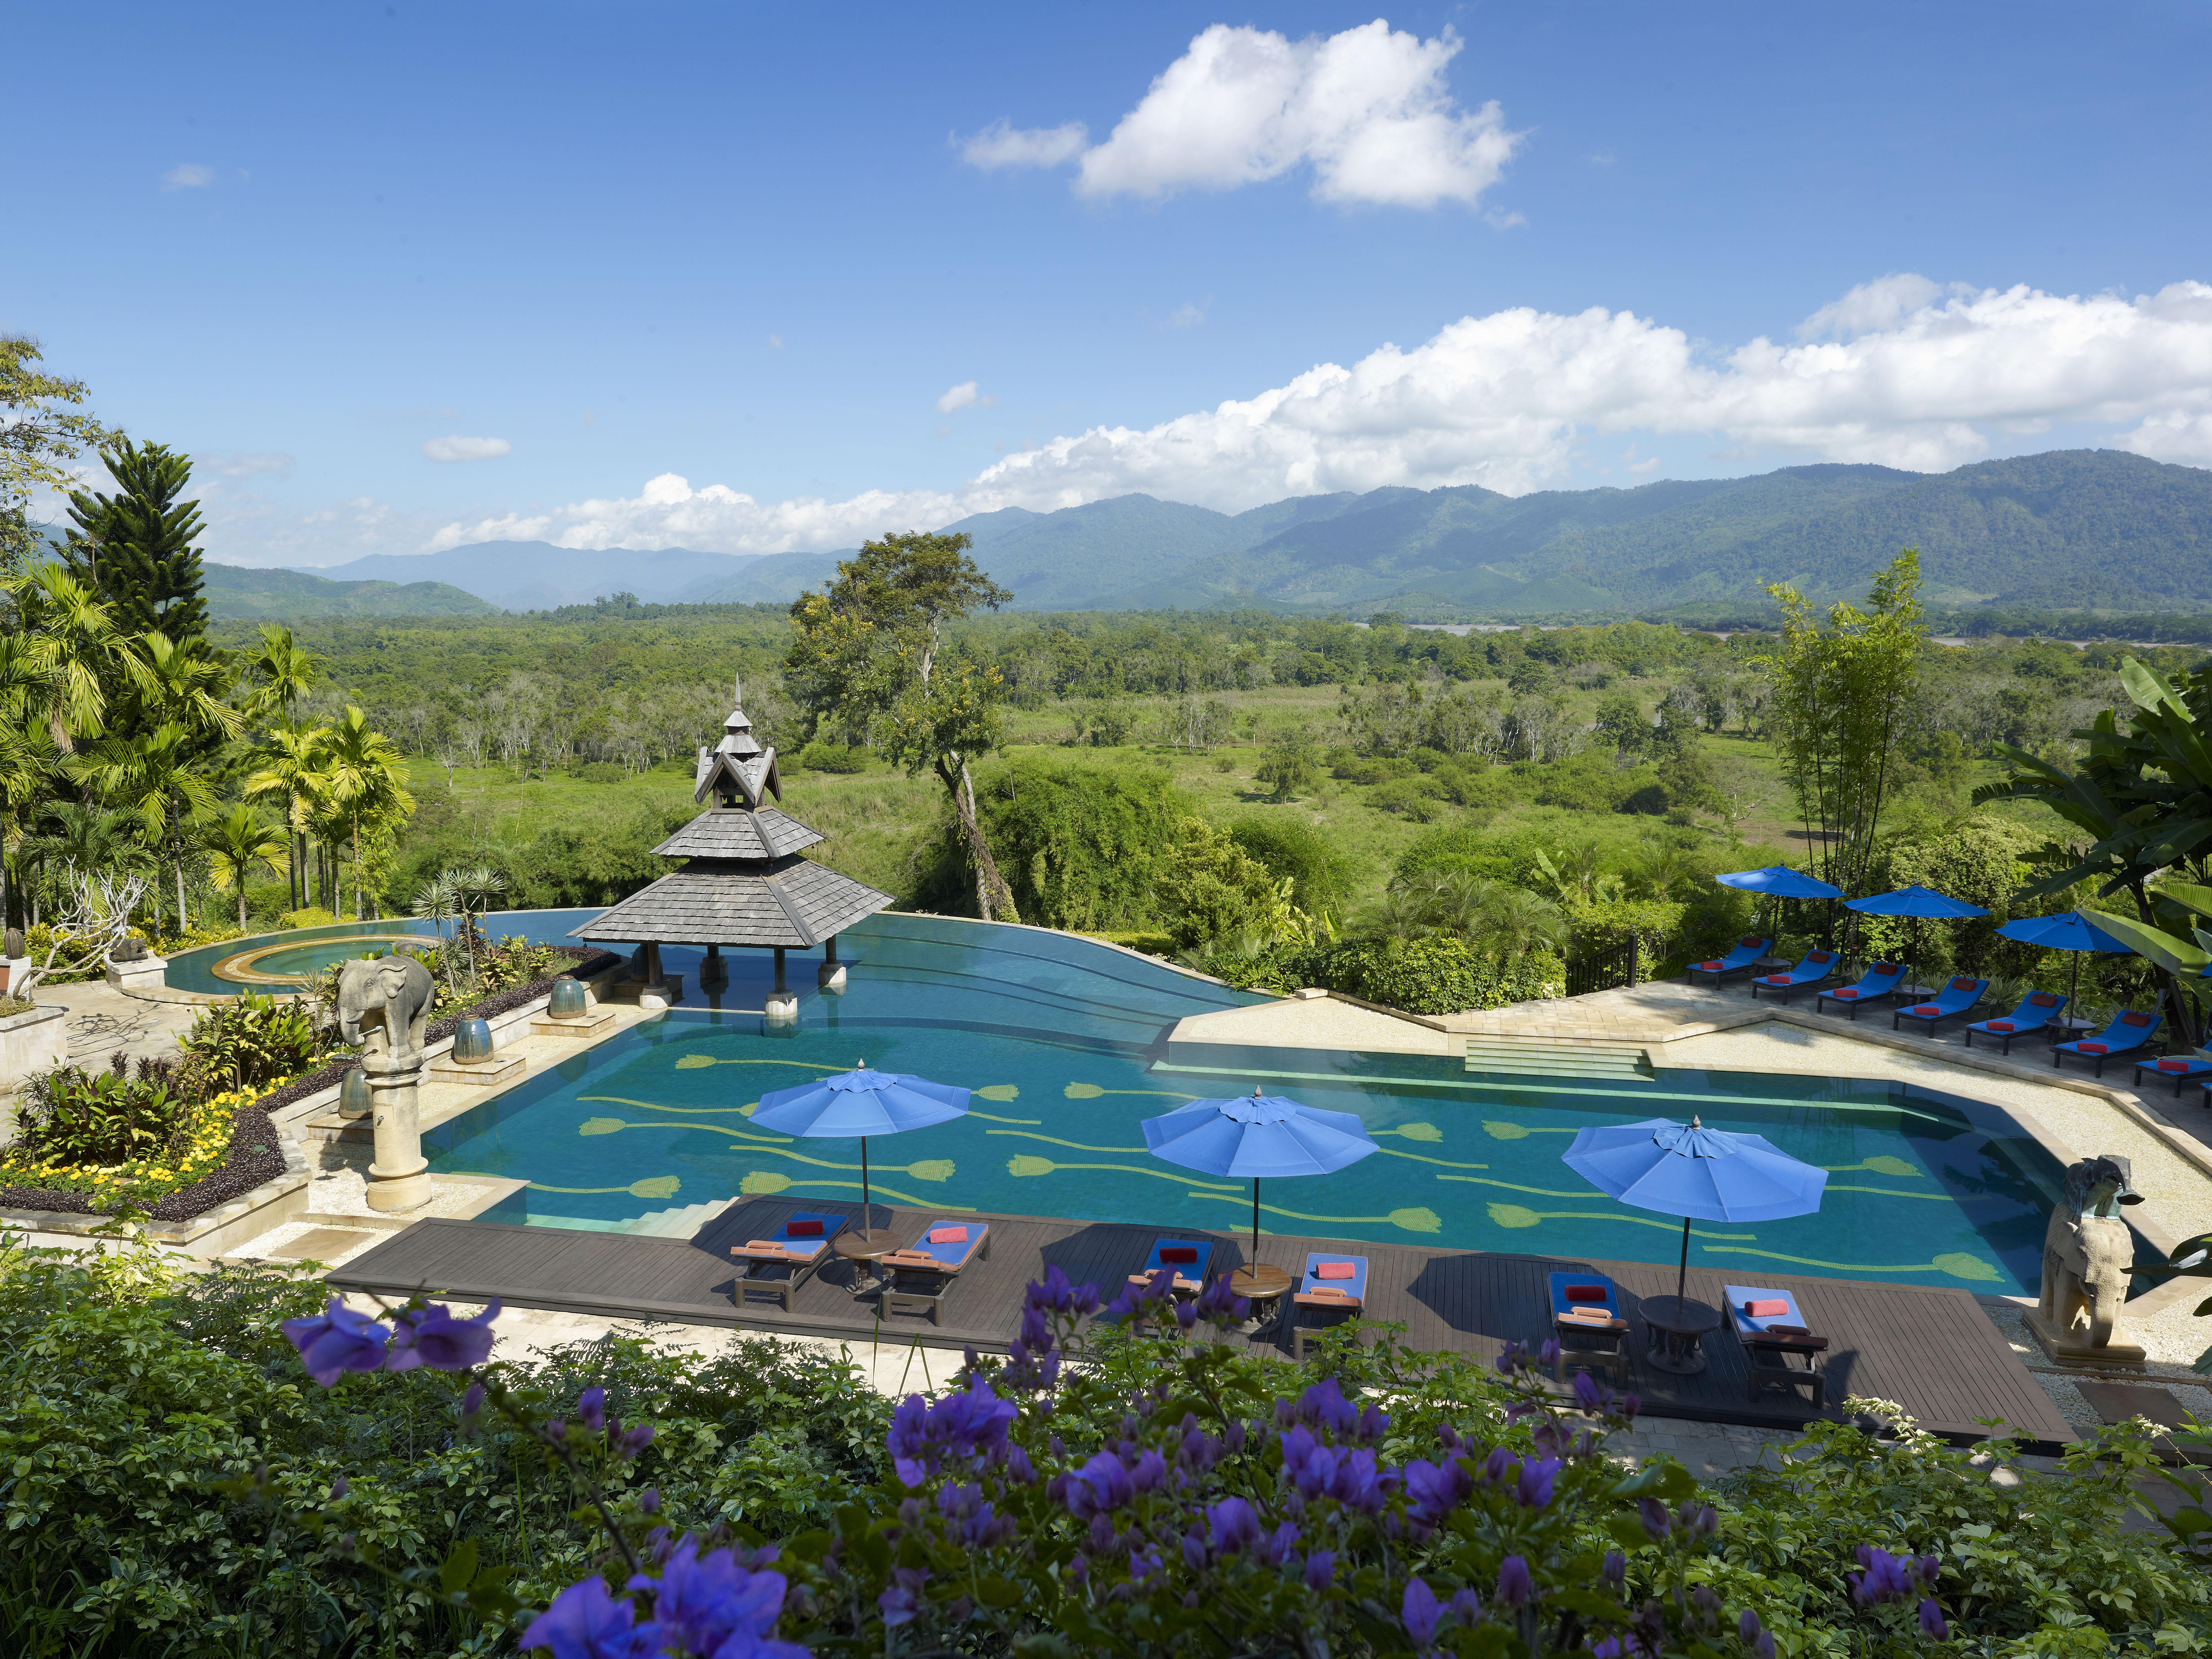 Asia S 10 Best Hotel Pools Prestige Online Society S